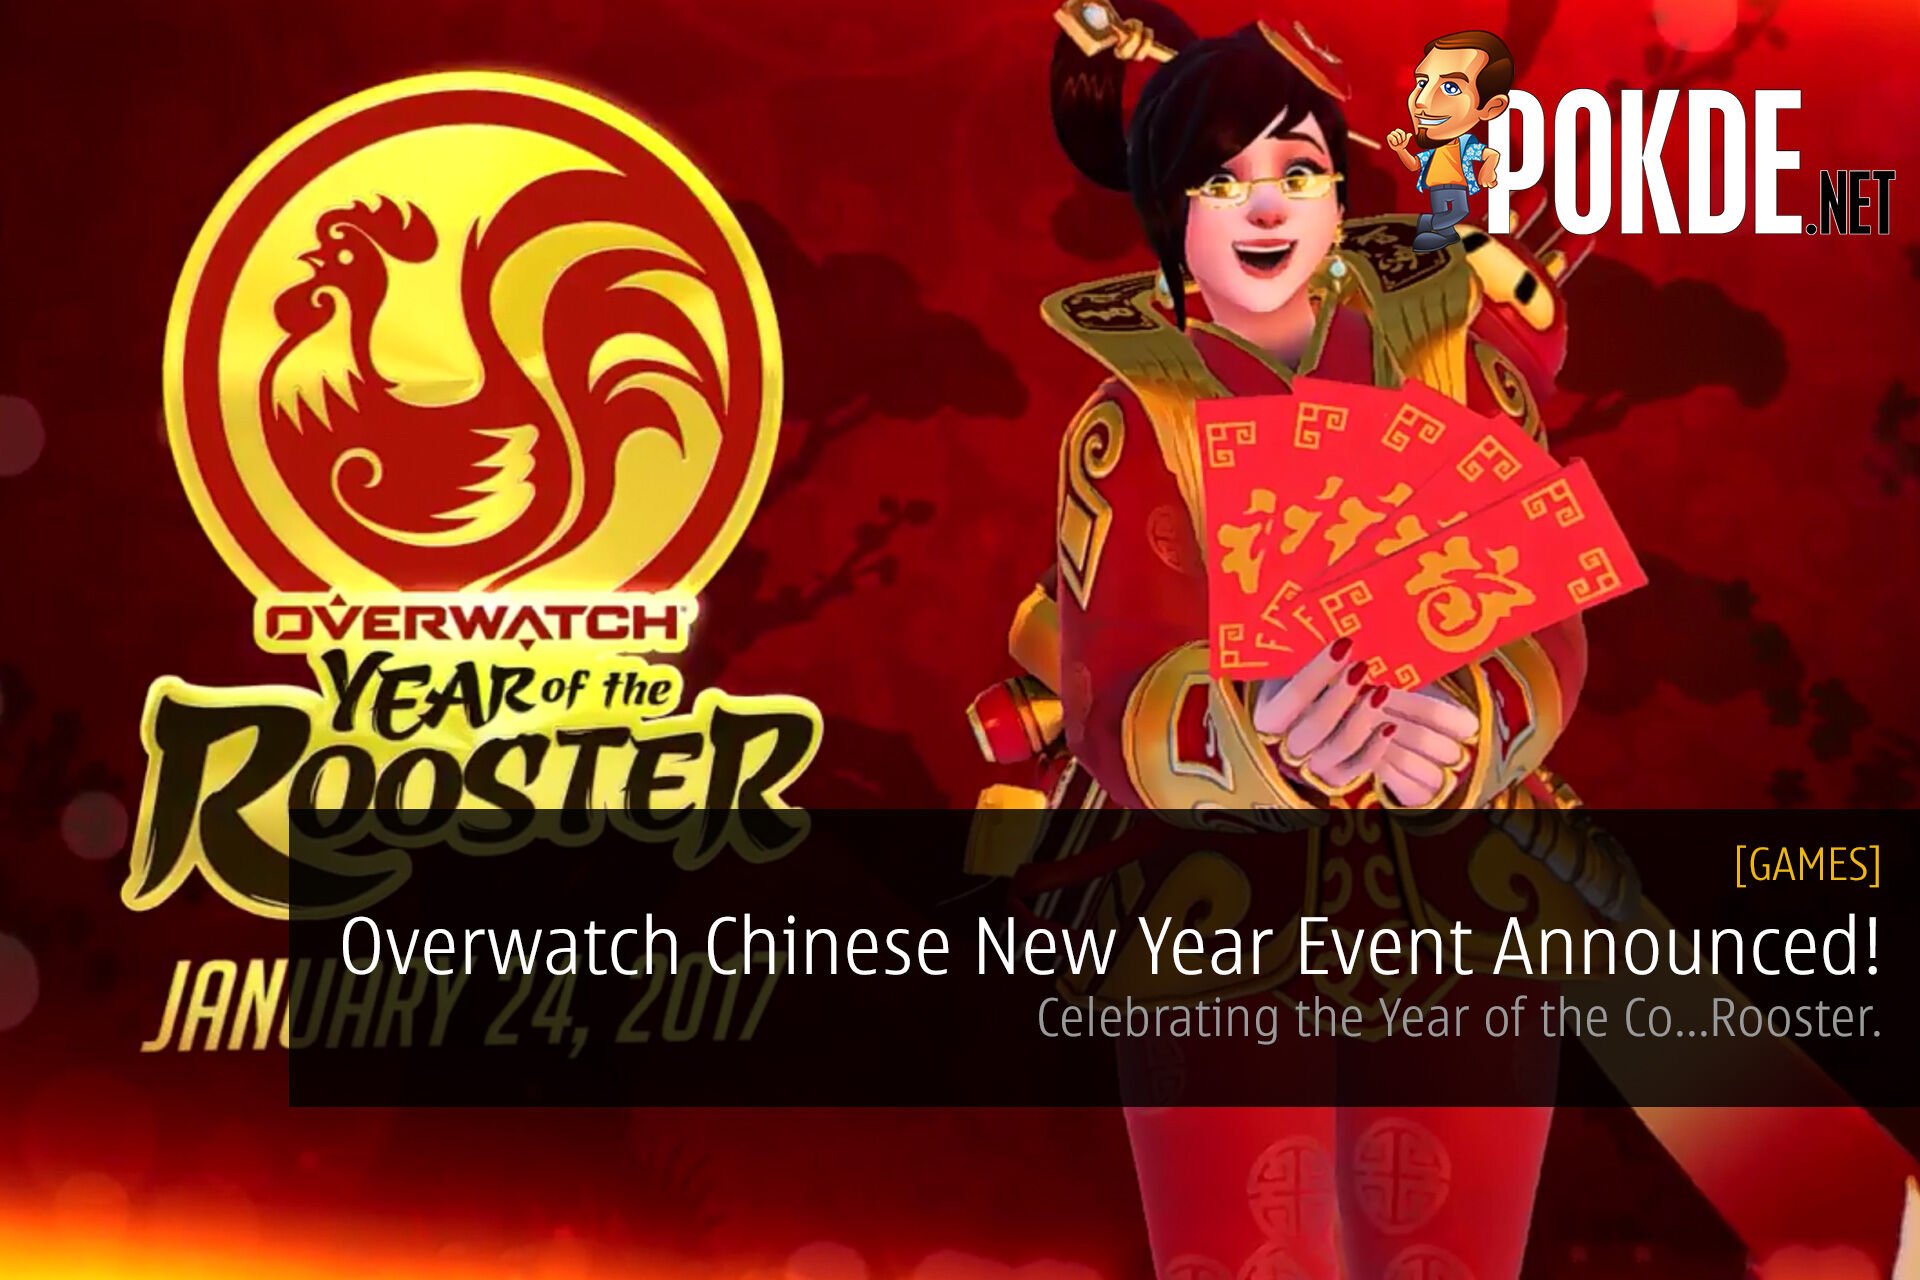 blizzard overwatch chinese new year